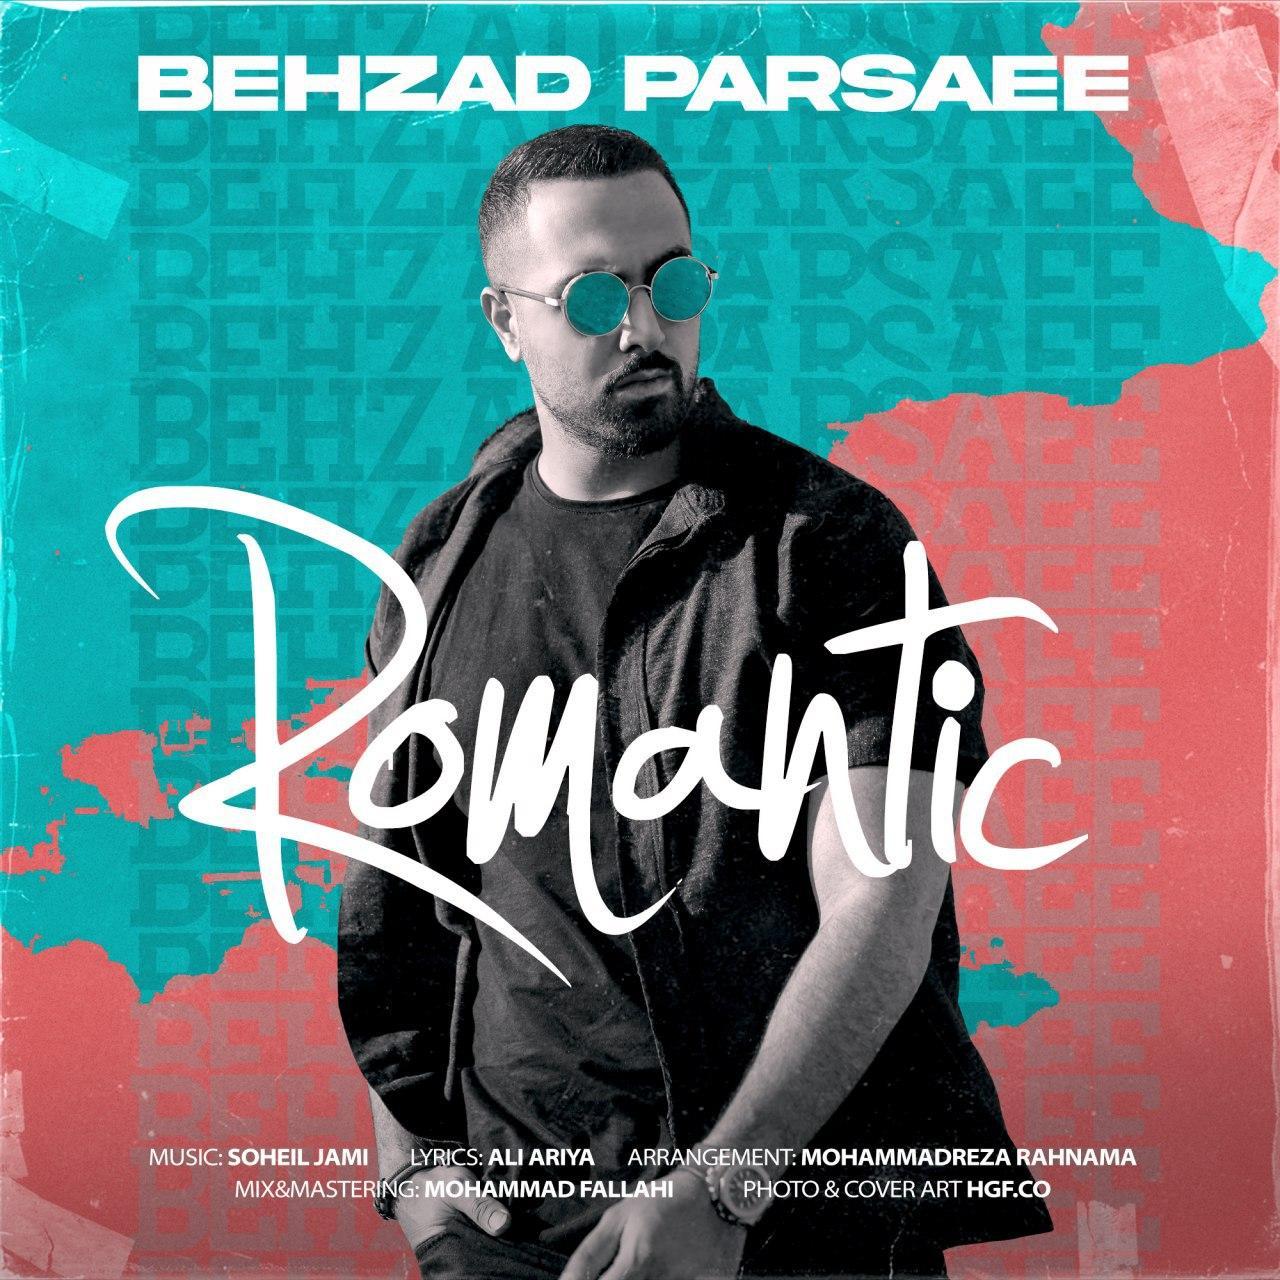 Behzad Parsaee – Romantic